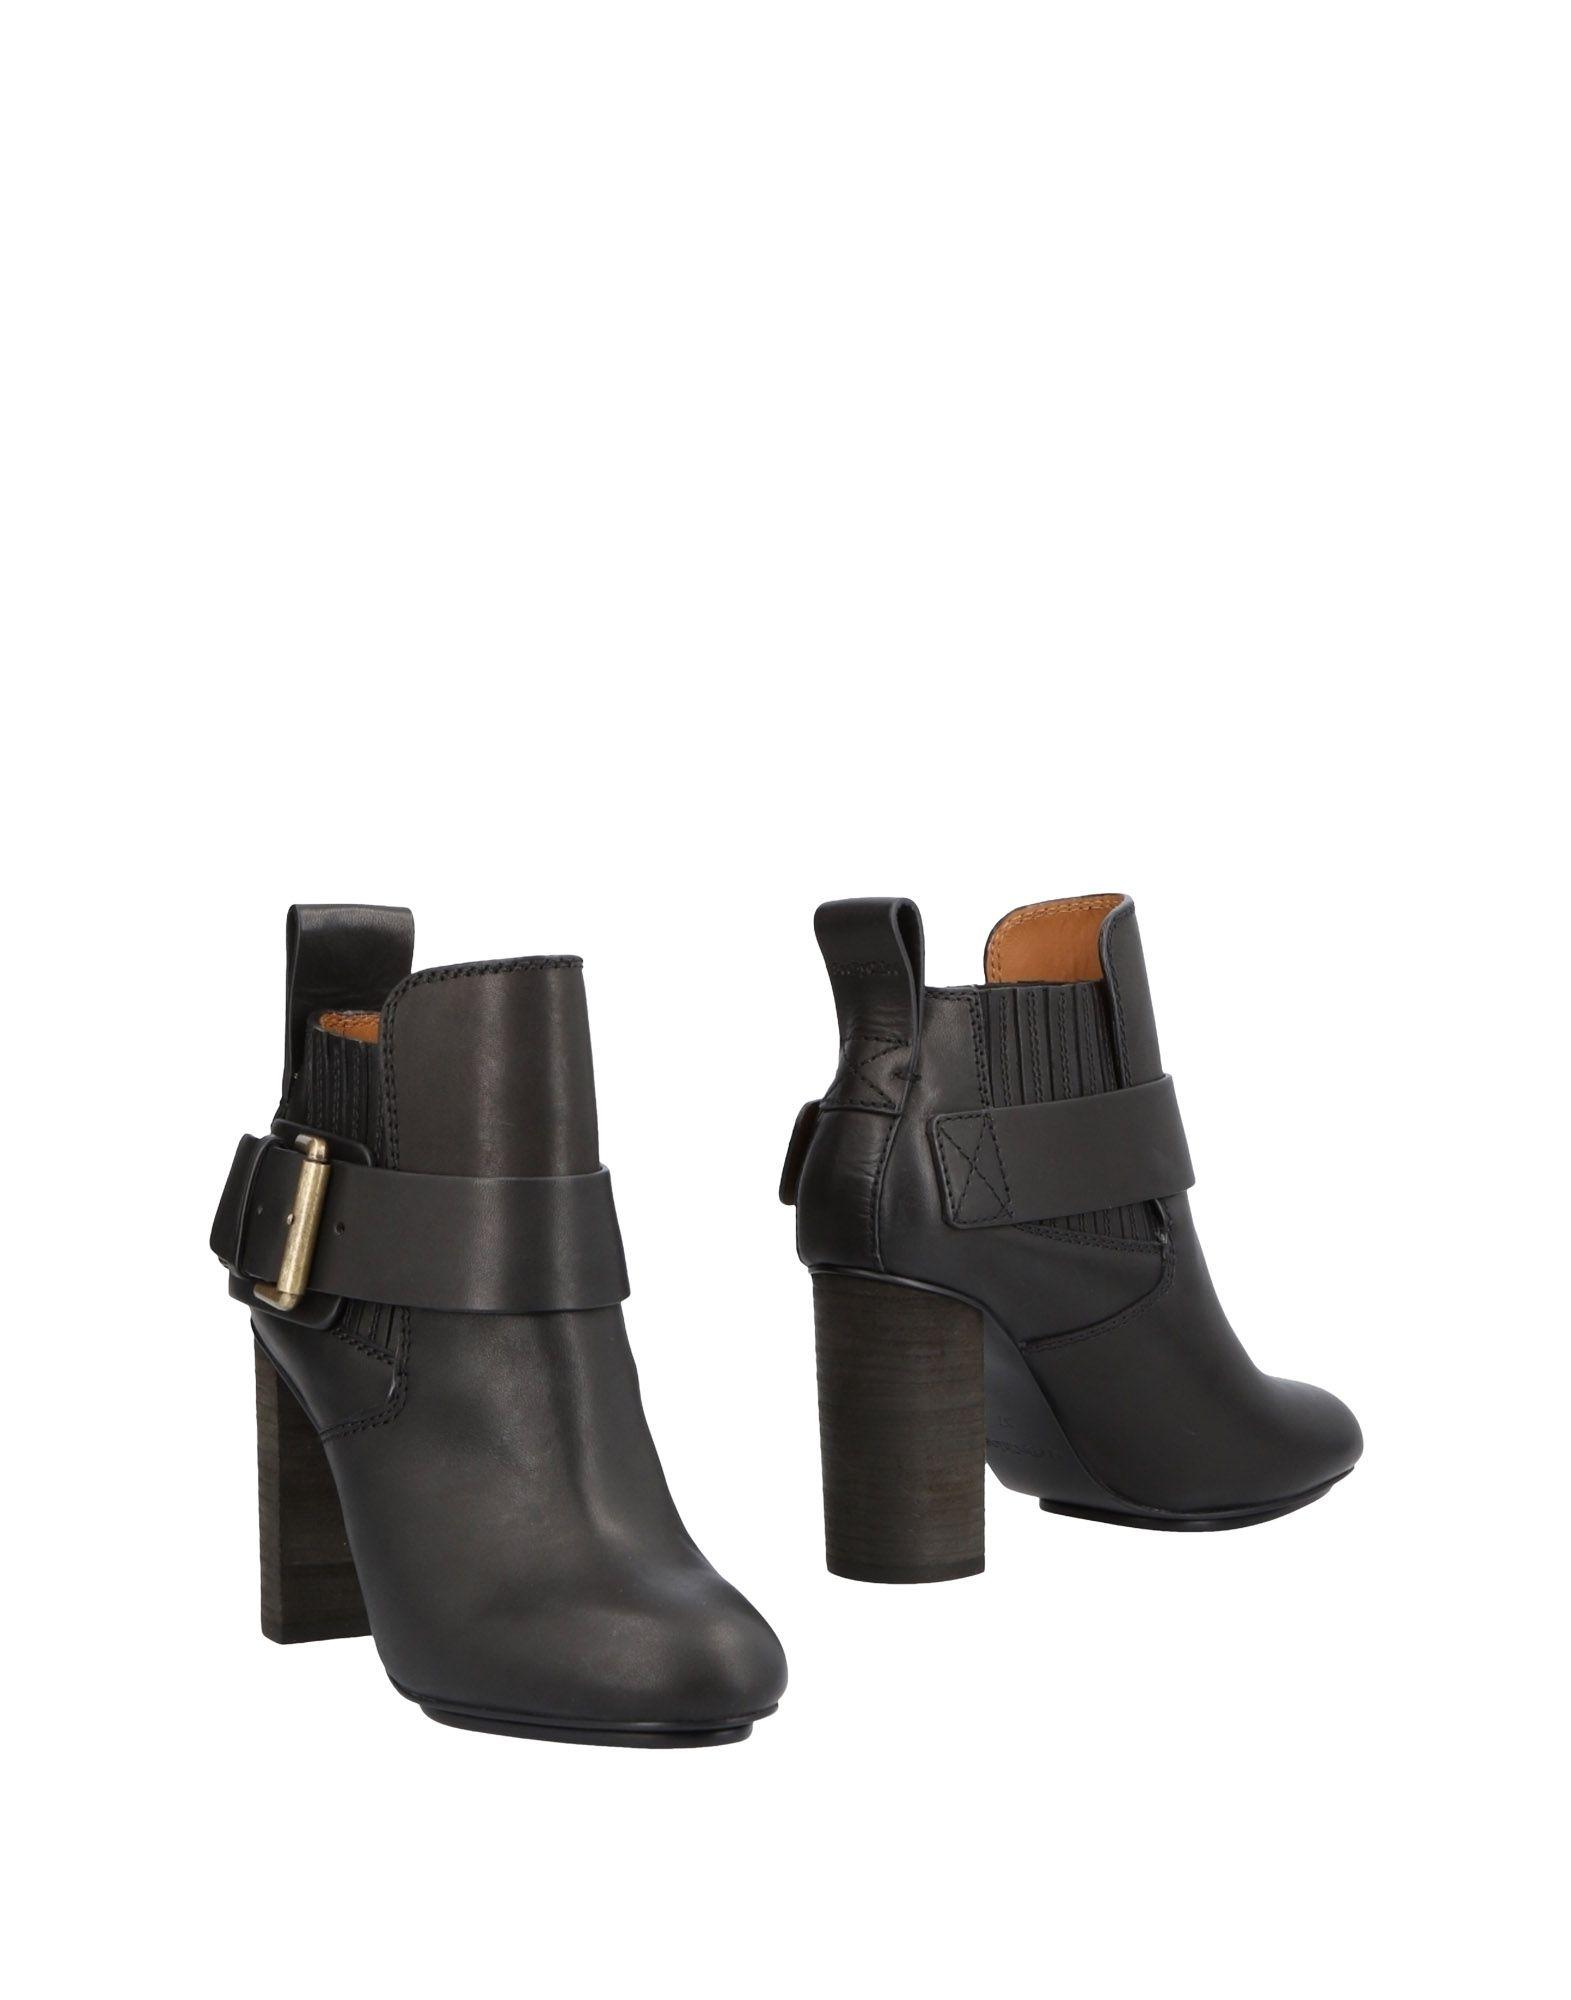 SEE BY CHLOÉ Полусапоги и высокие ботинки hansgrohe 52053000